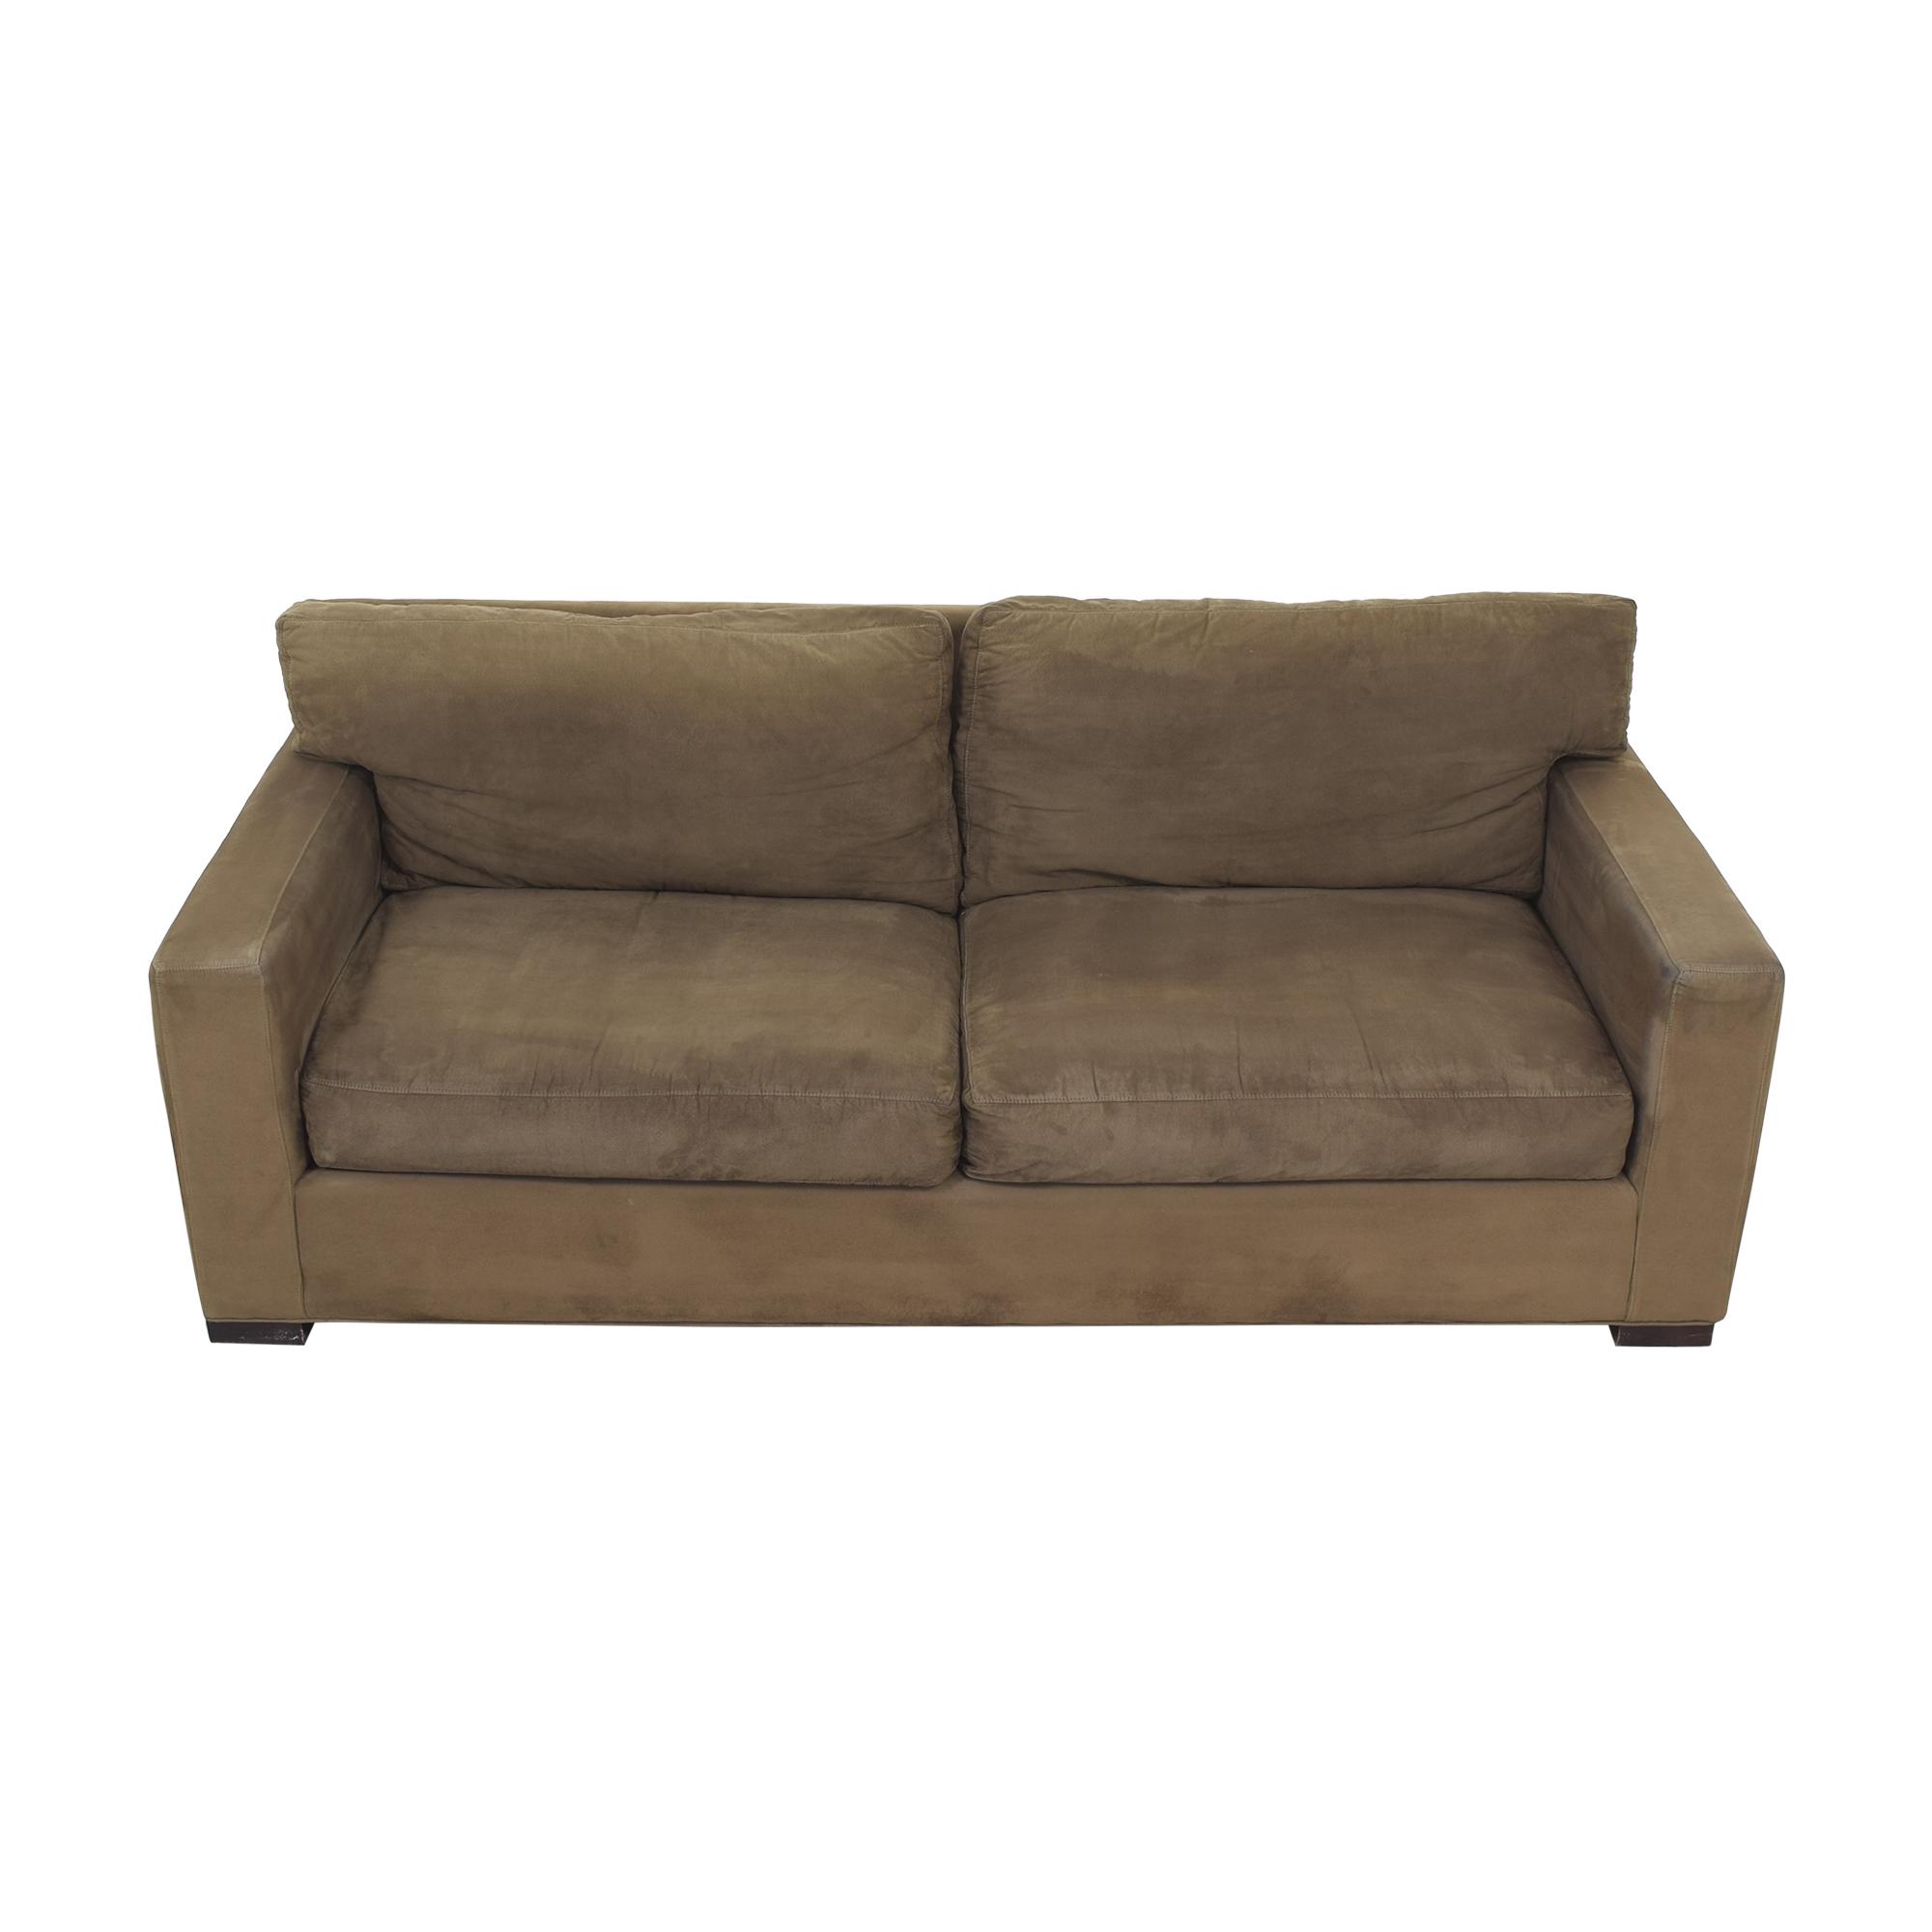 Crate & Barrel Crate & Barrel Axis II Two Cushion Sofa brown